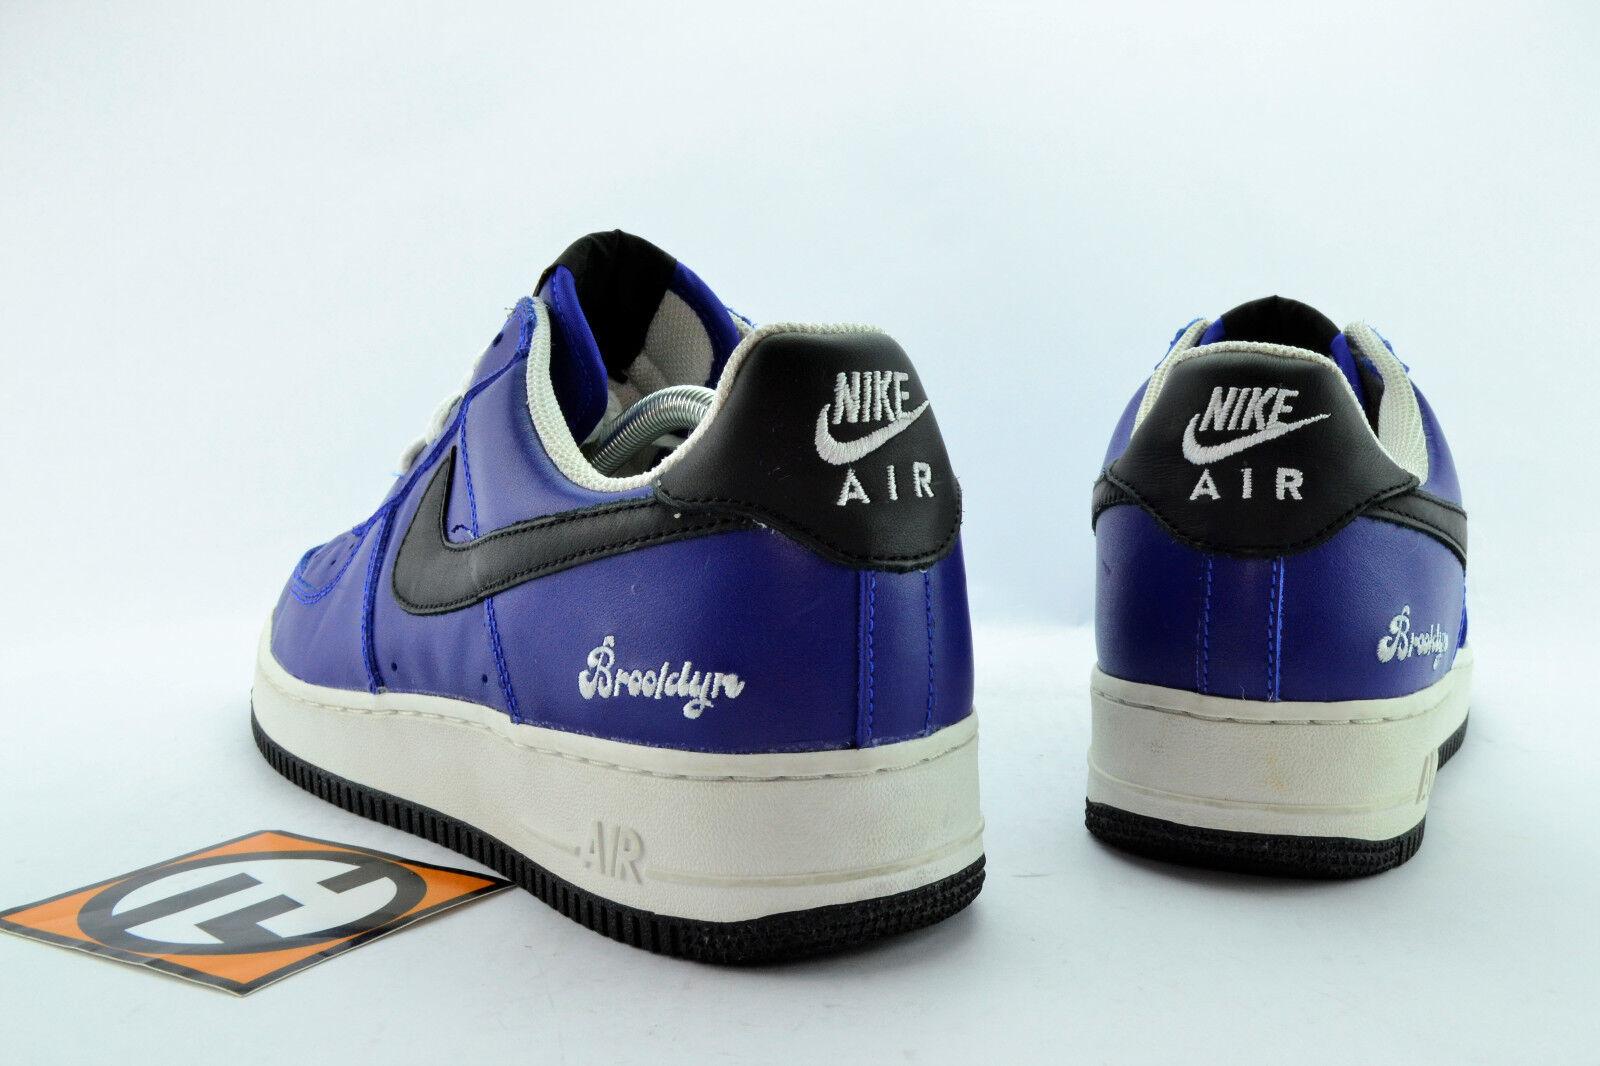 Nike Air Force 1 Brooklyn Sport Royal Black White Size 10.5 2004' 306353 401